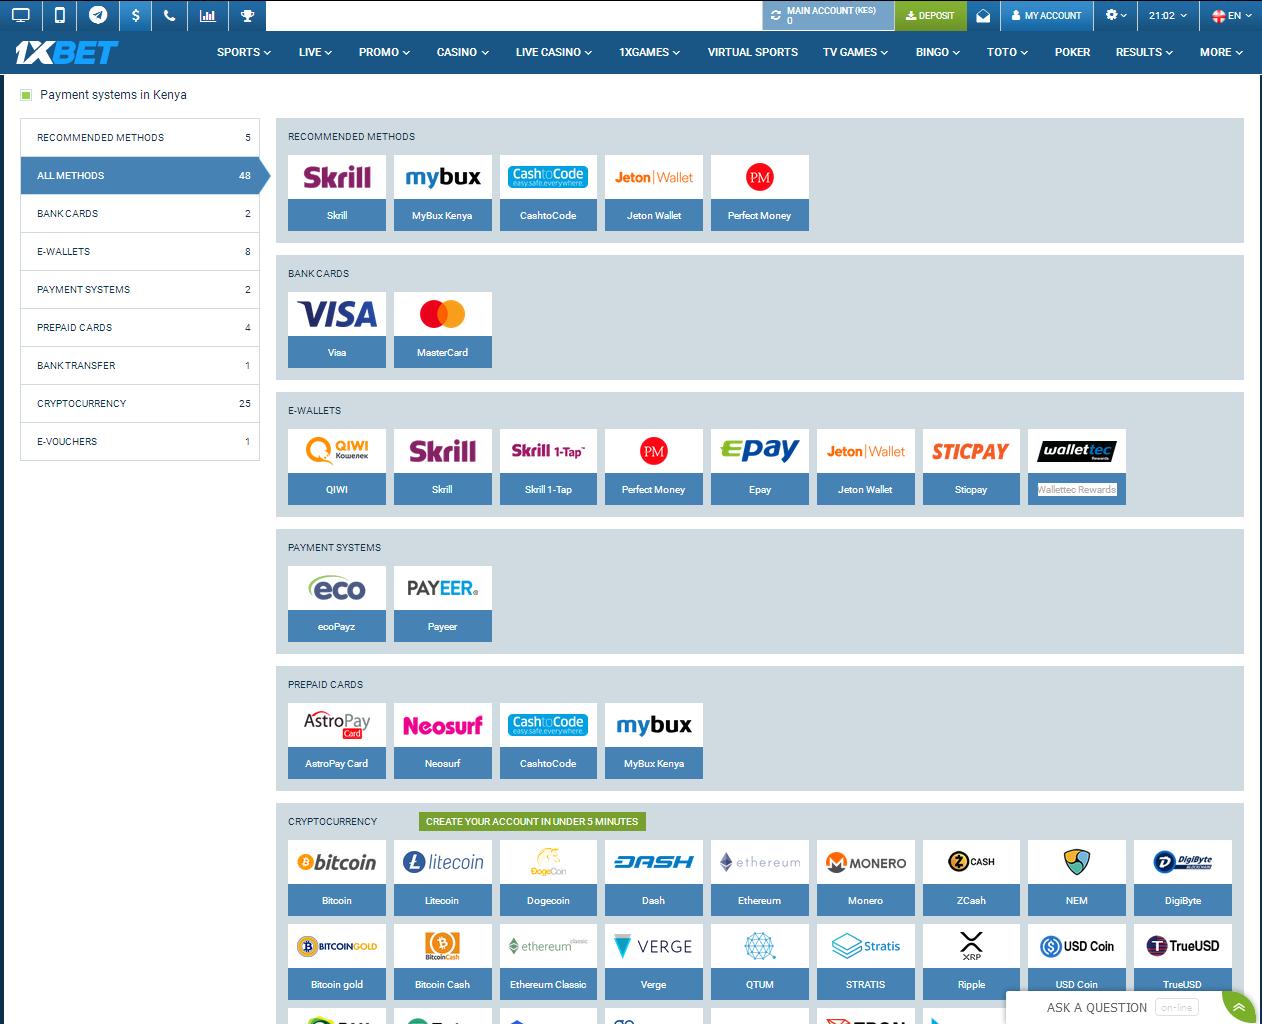 Payment Methods for Kenya